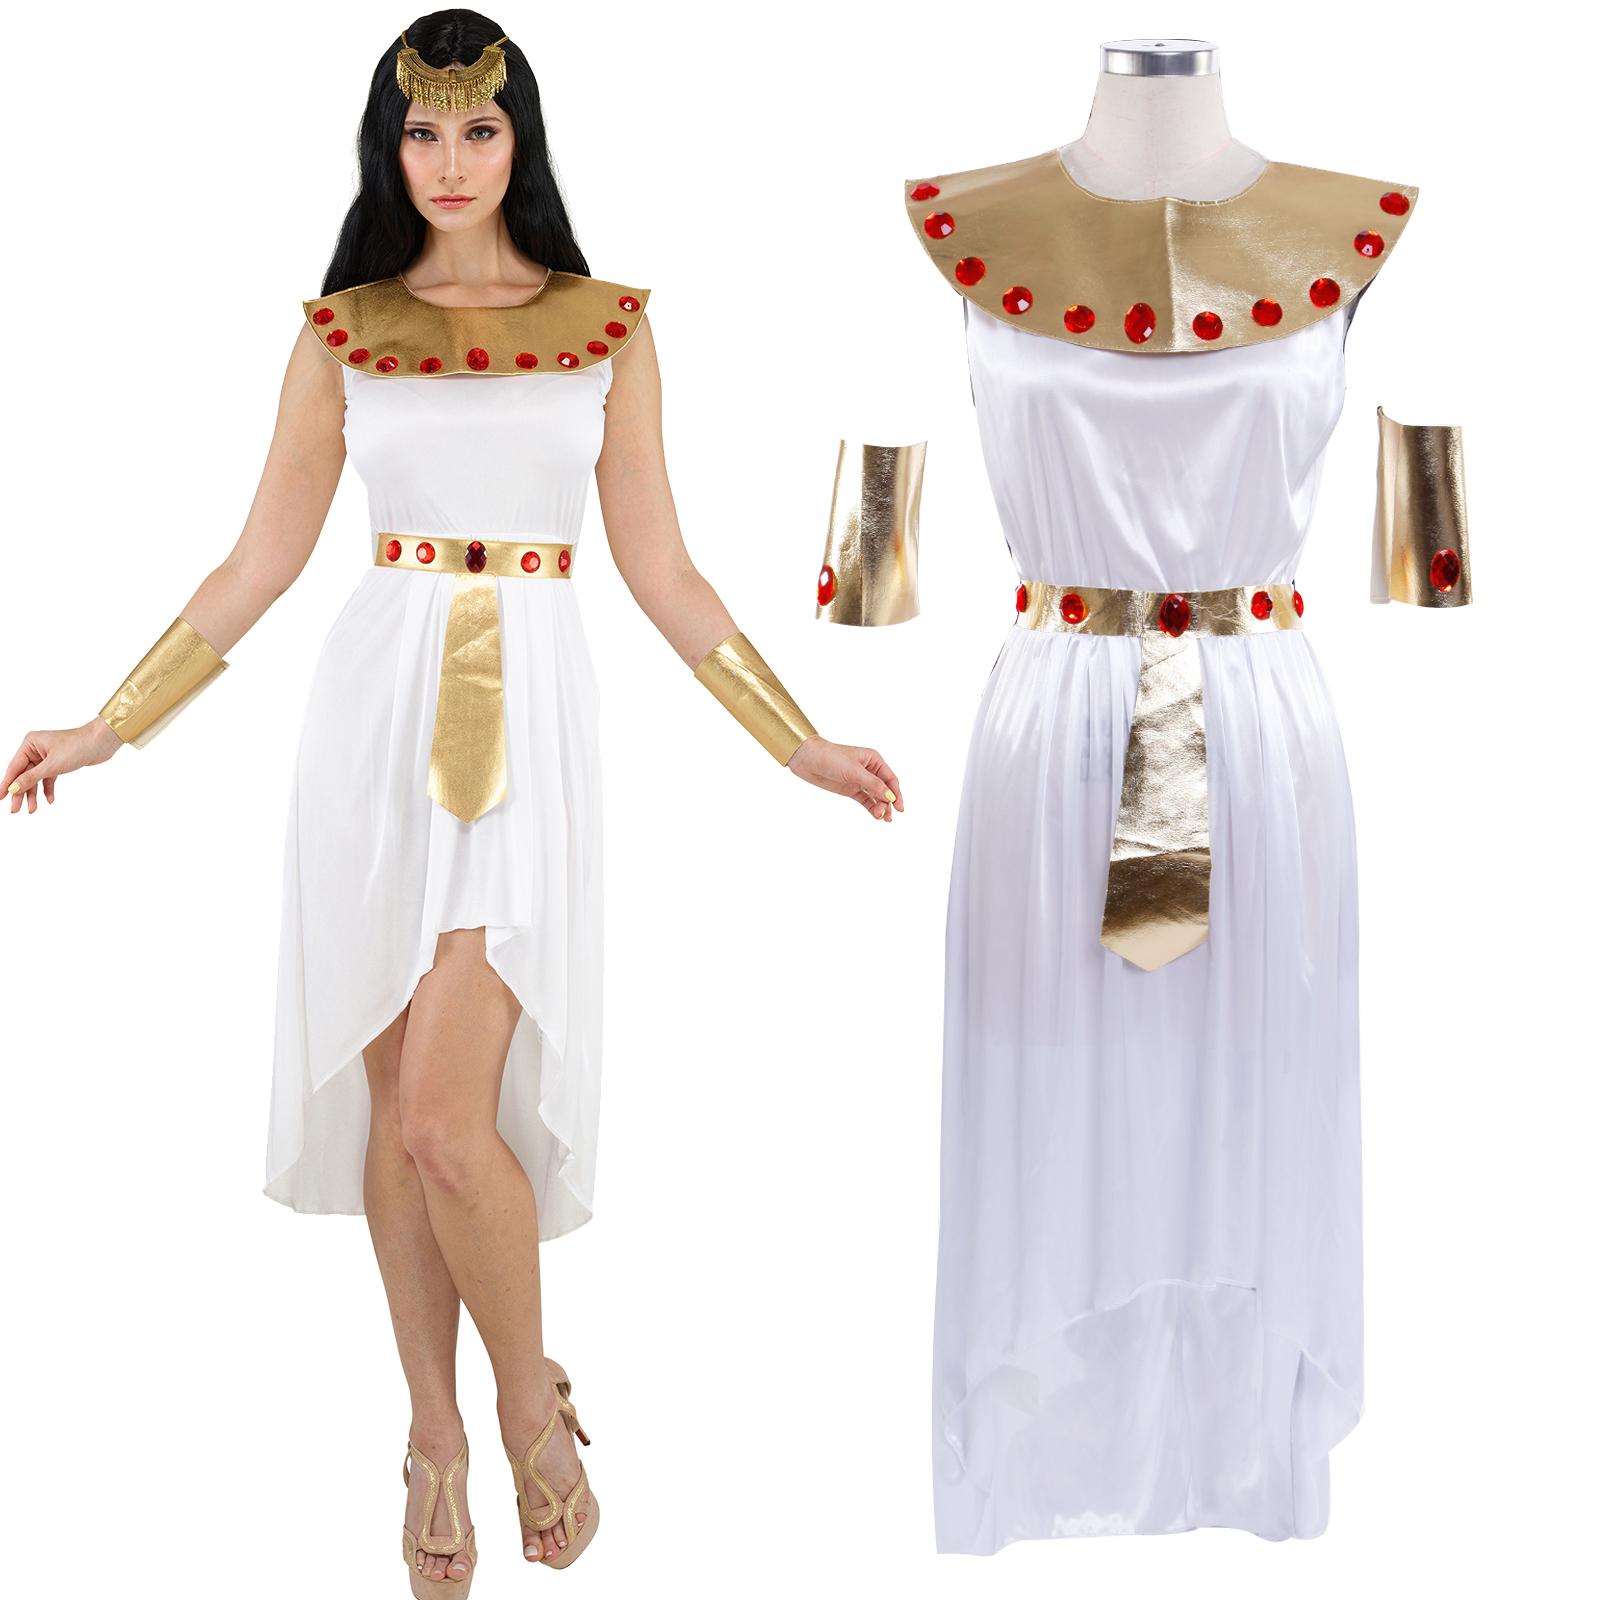 gypterin kost m gypten kleider cleopatra kleopatra cleopatrakost m halloween ebay. Black Bedroom Furniture Sets. Home Design Ideas